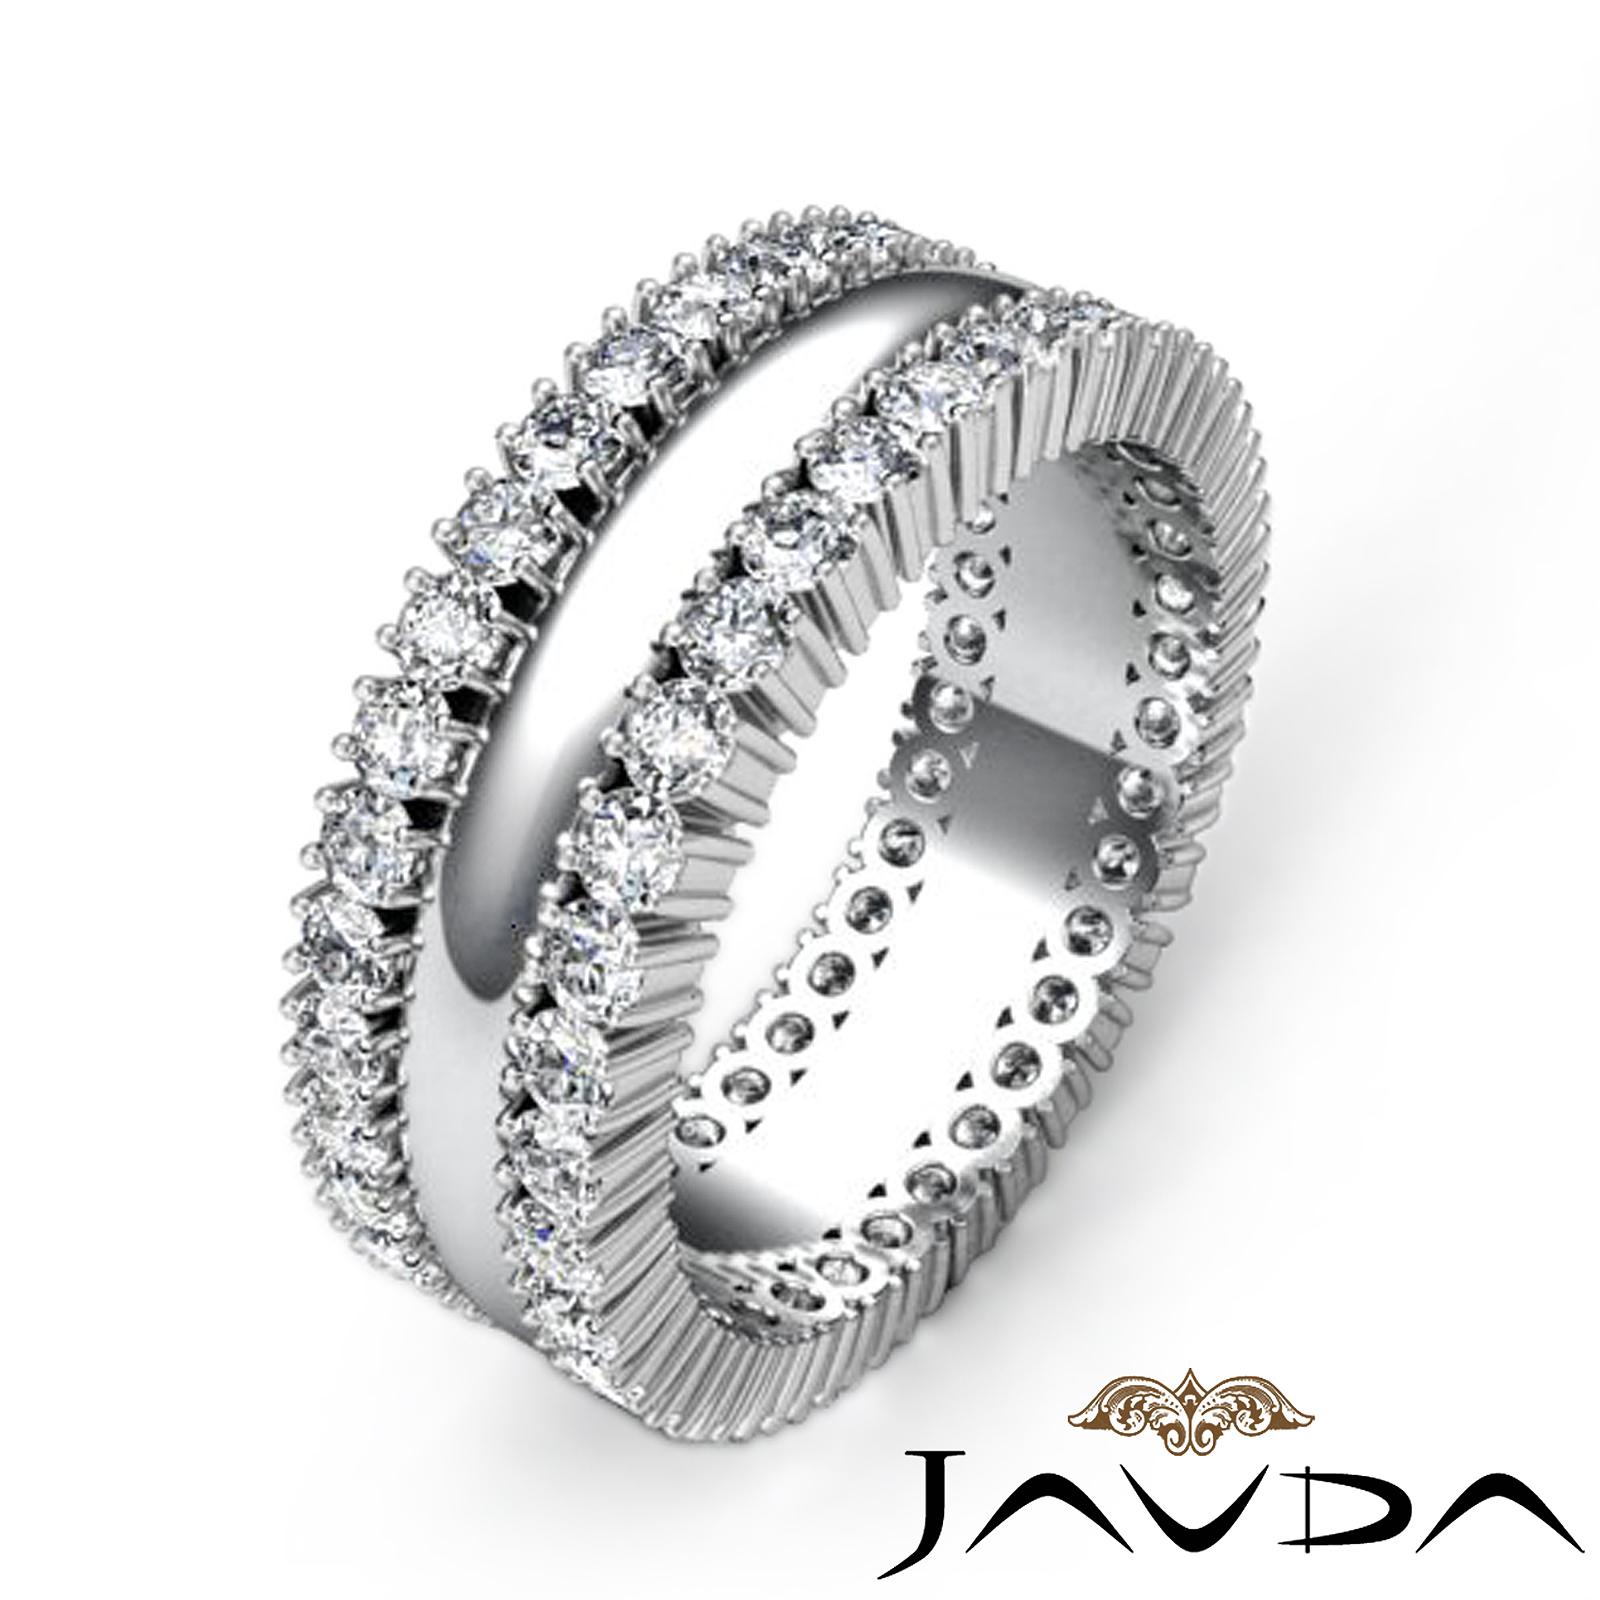 8mm mens wedding solid band prong diamond eternity ring for Mens eternity wedding band